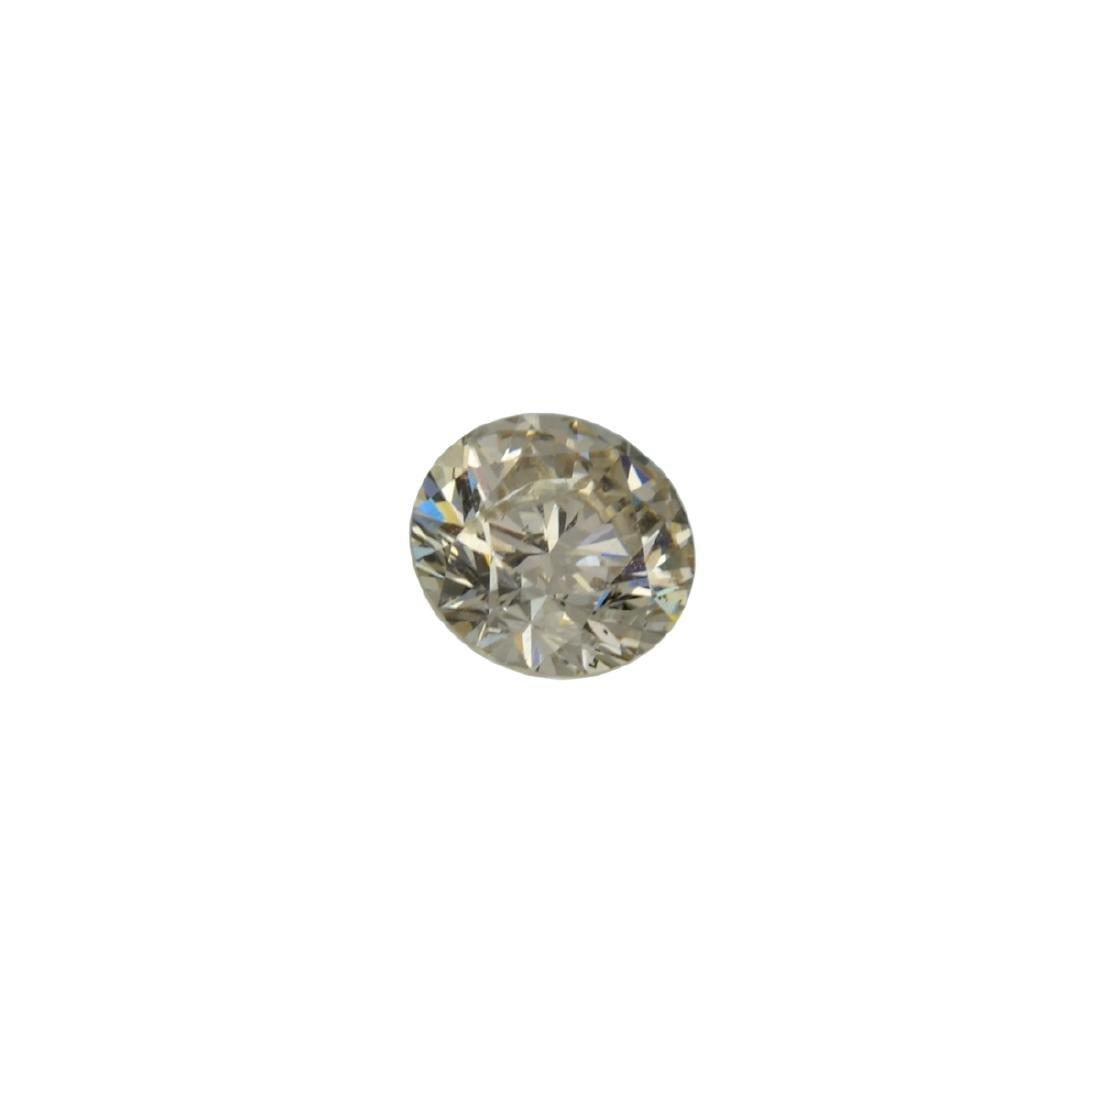 Fine Jewelry GIA Certified 0.59CT Brilliant Round Cut